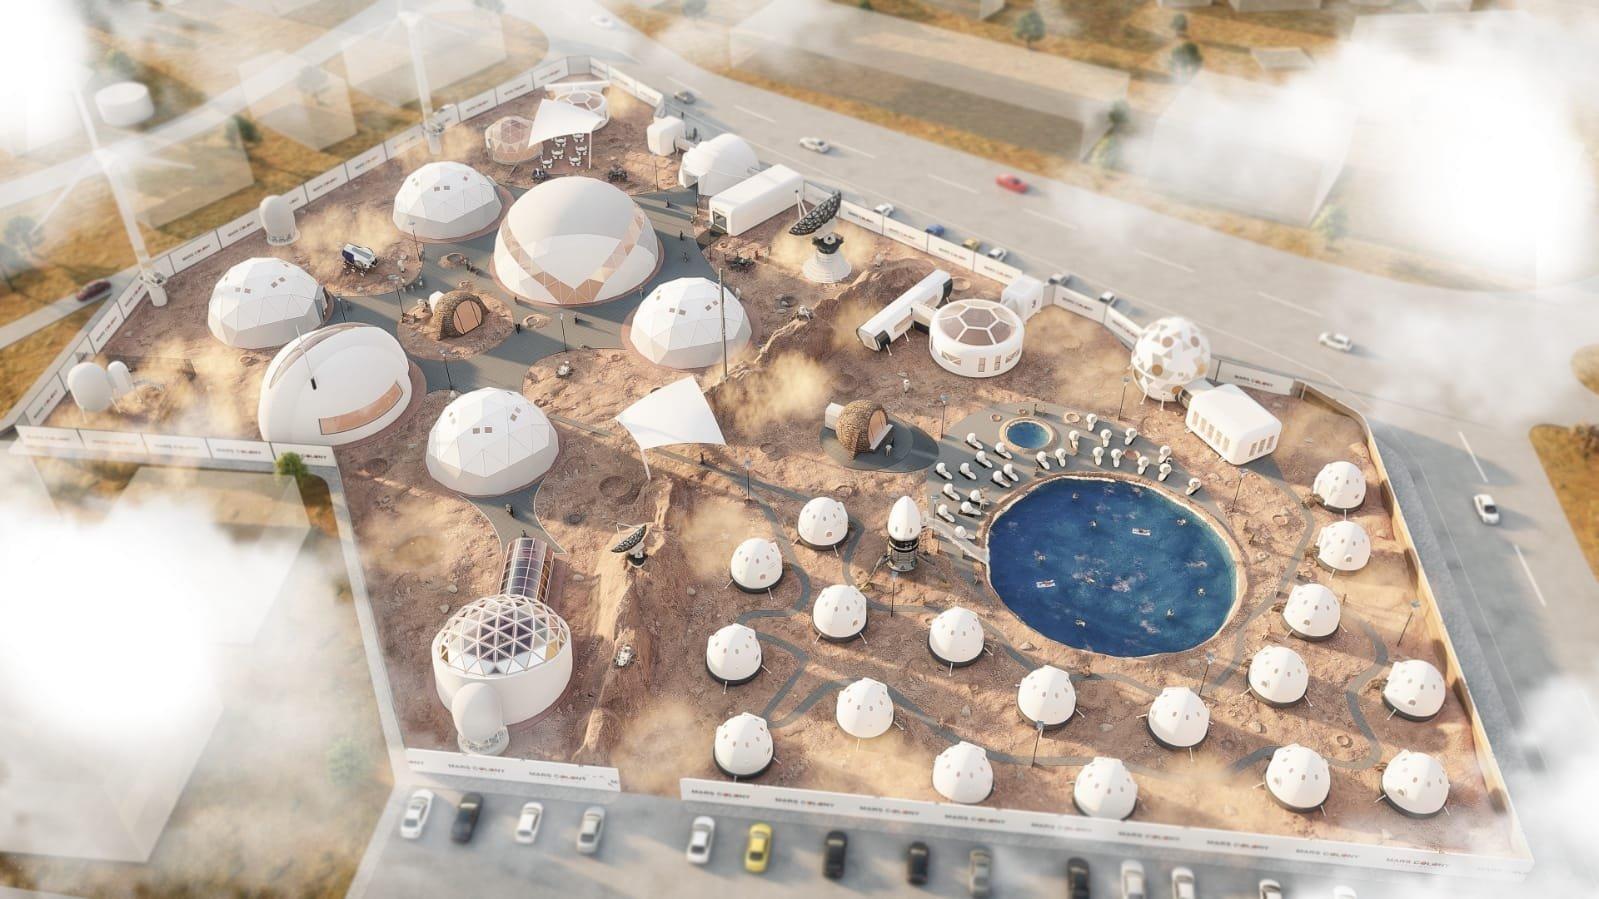 A virtual plan of the Mars Colony. (AA PHOTO)